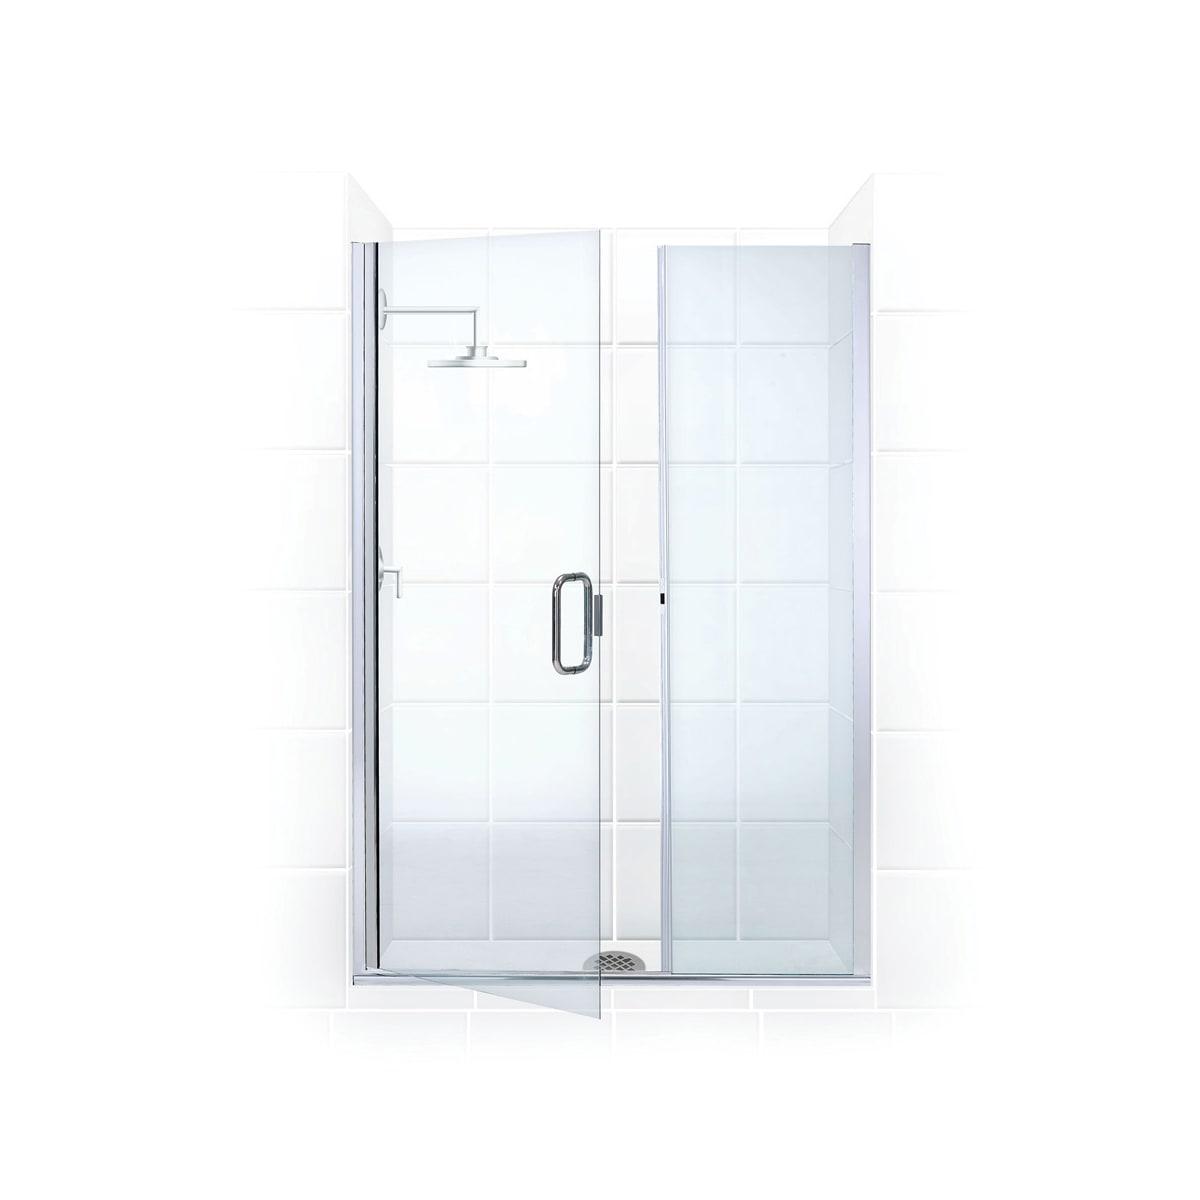 Coastal Shower Doors Hc49il 75 C